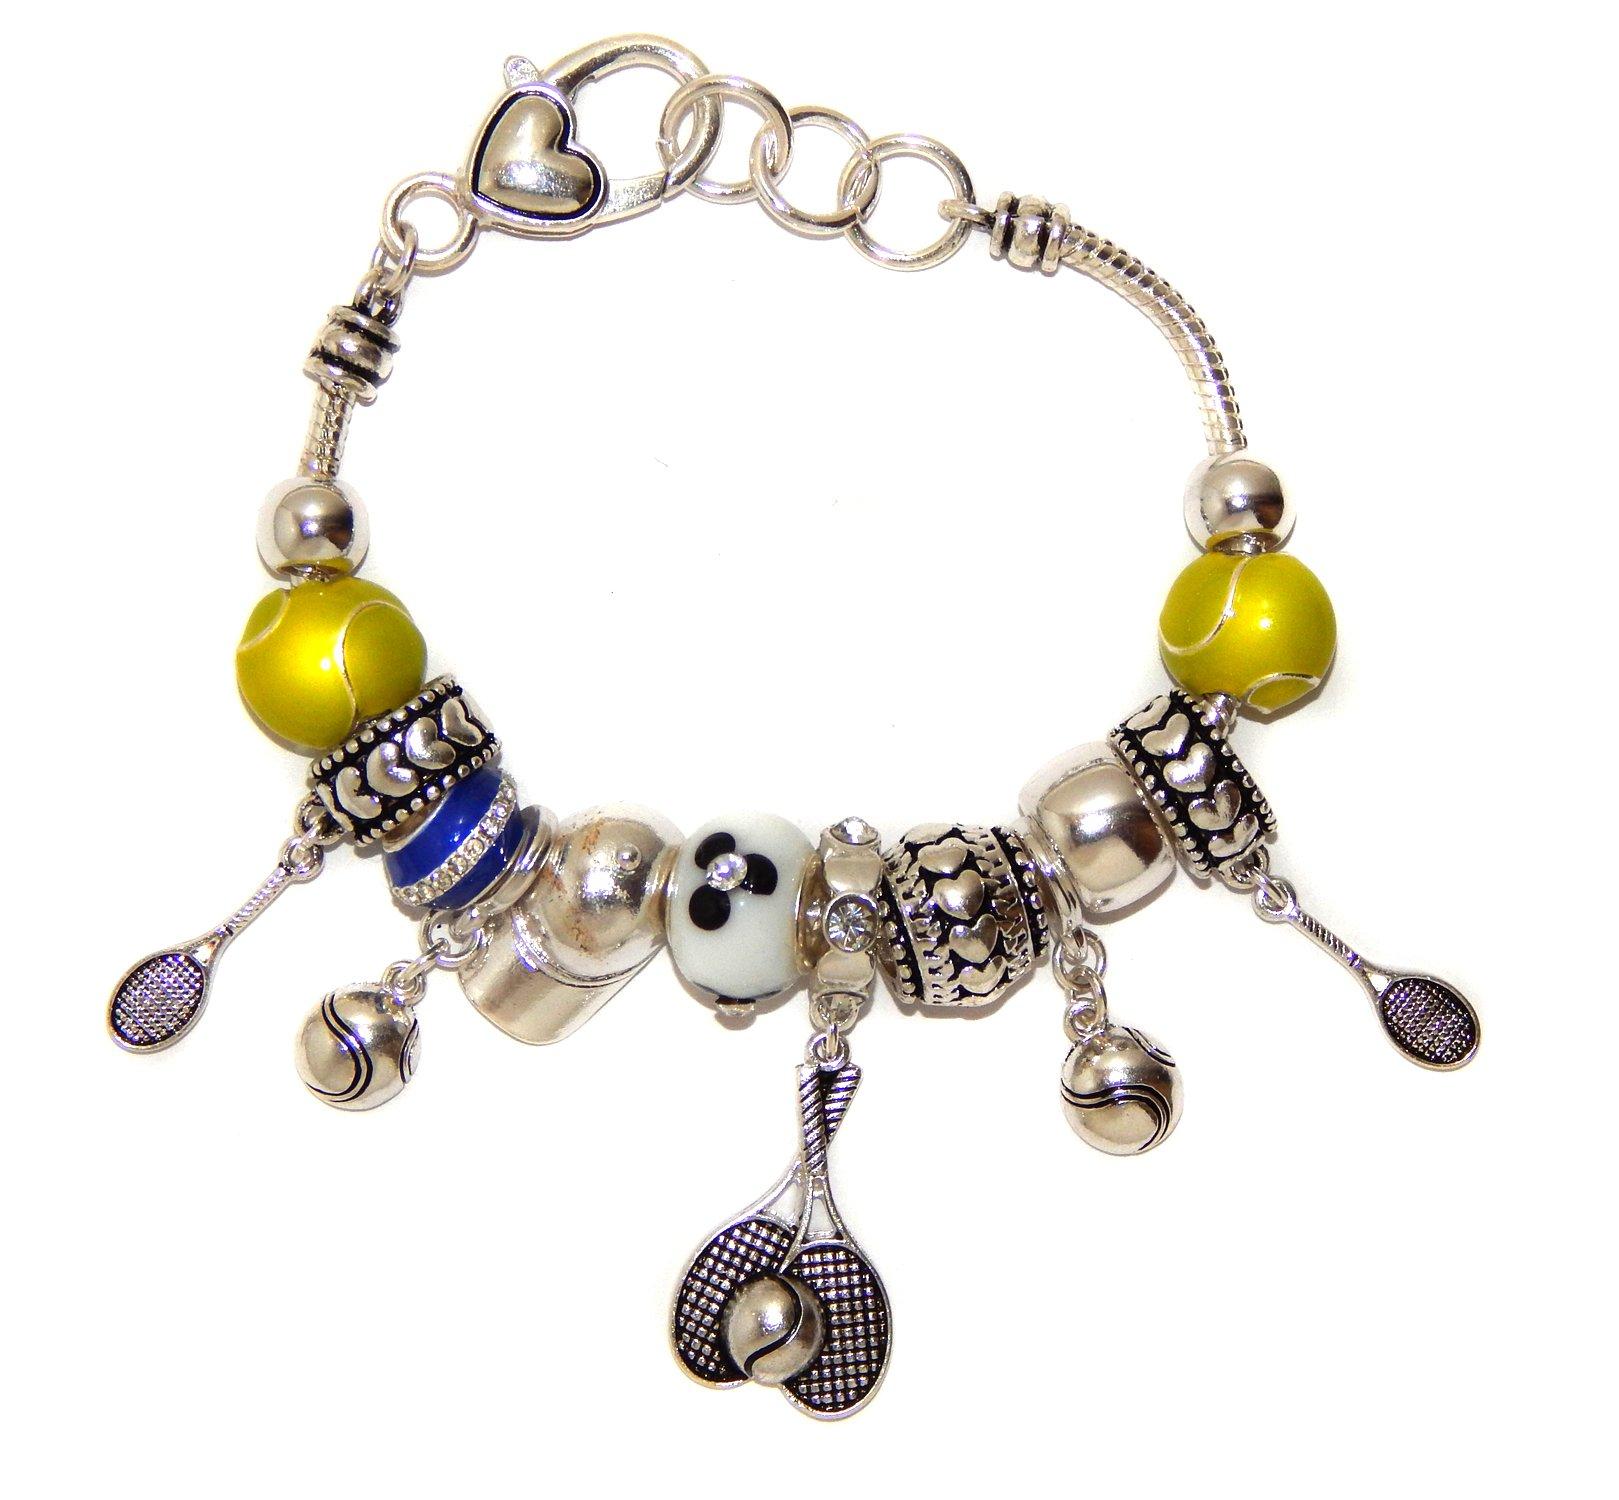 Landau Ambrosia Tennis Theme Charm Bracelet